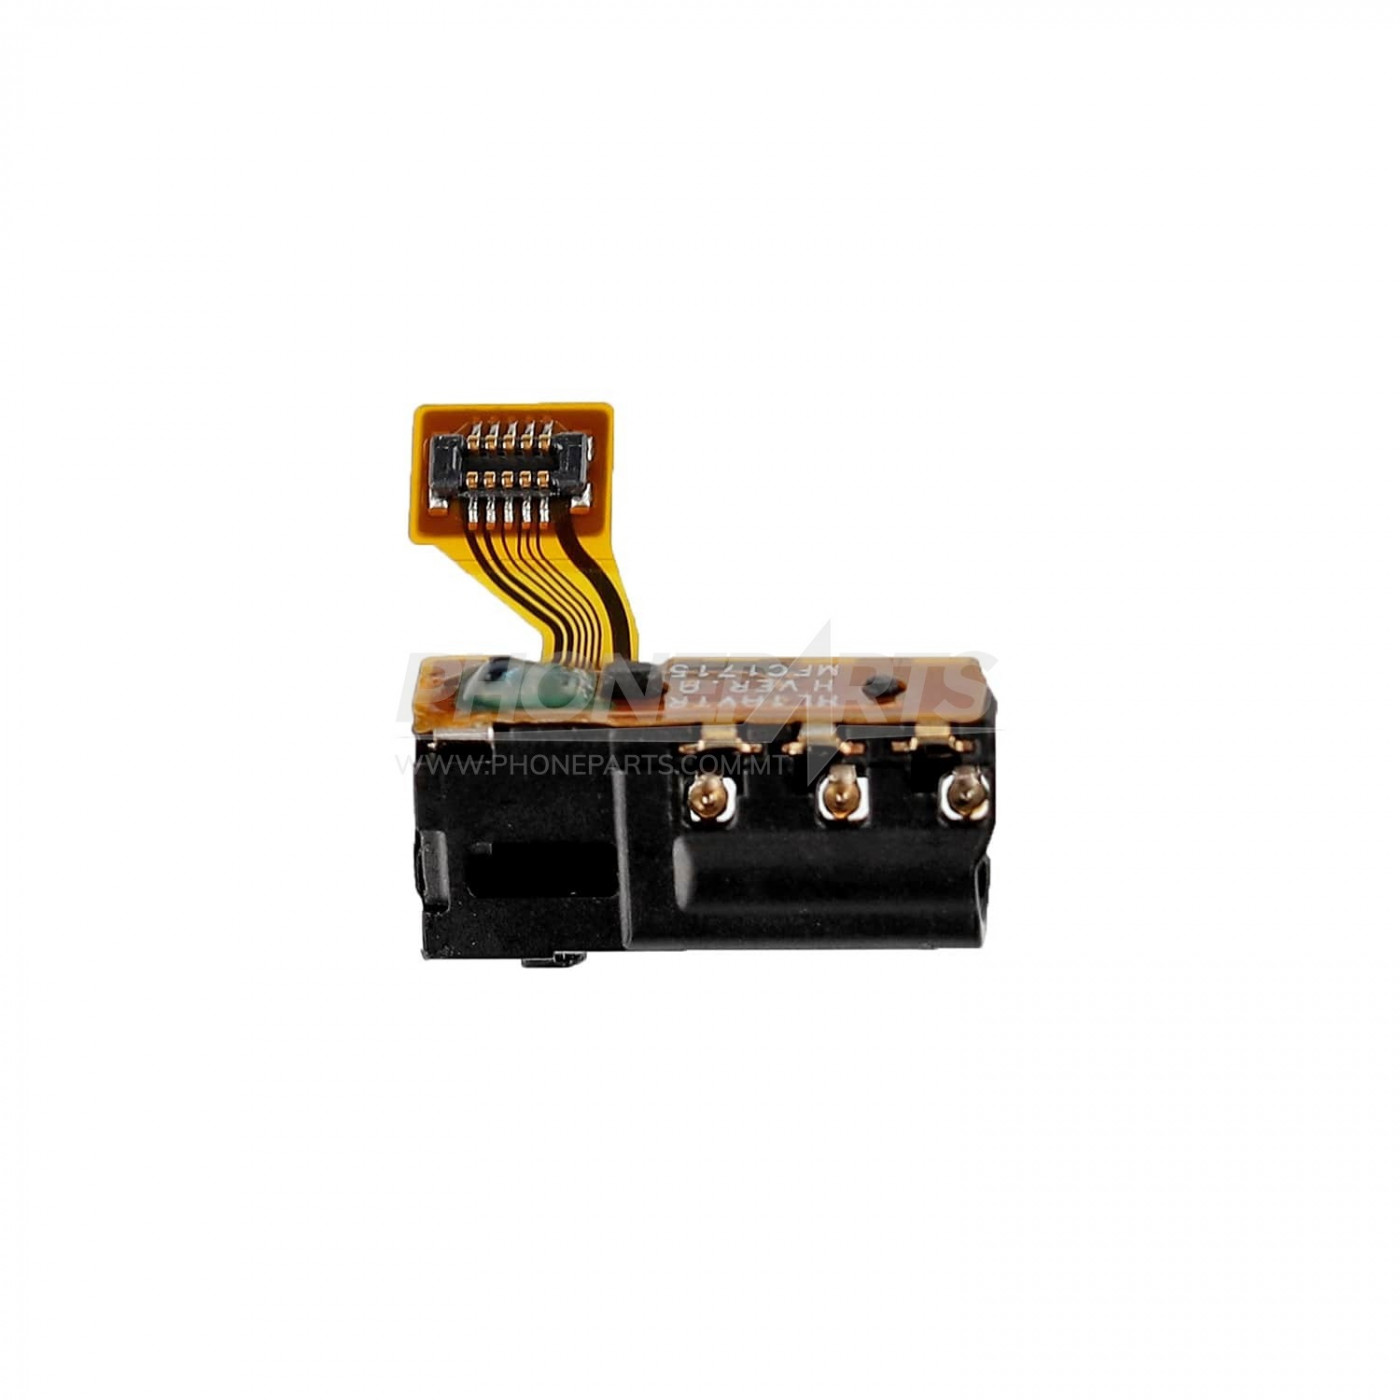 Conector de audio Flat flex para auriculares de reemplazo HUAWEI P10 Plus